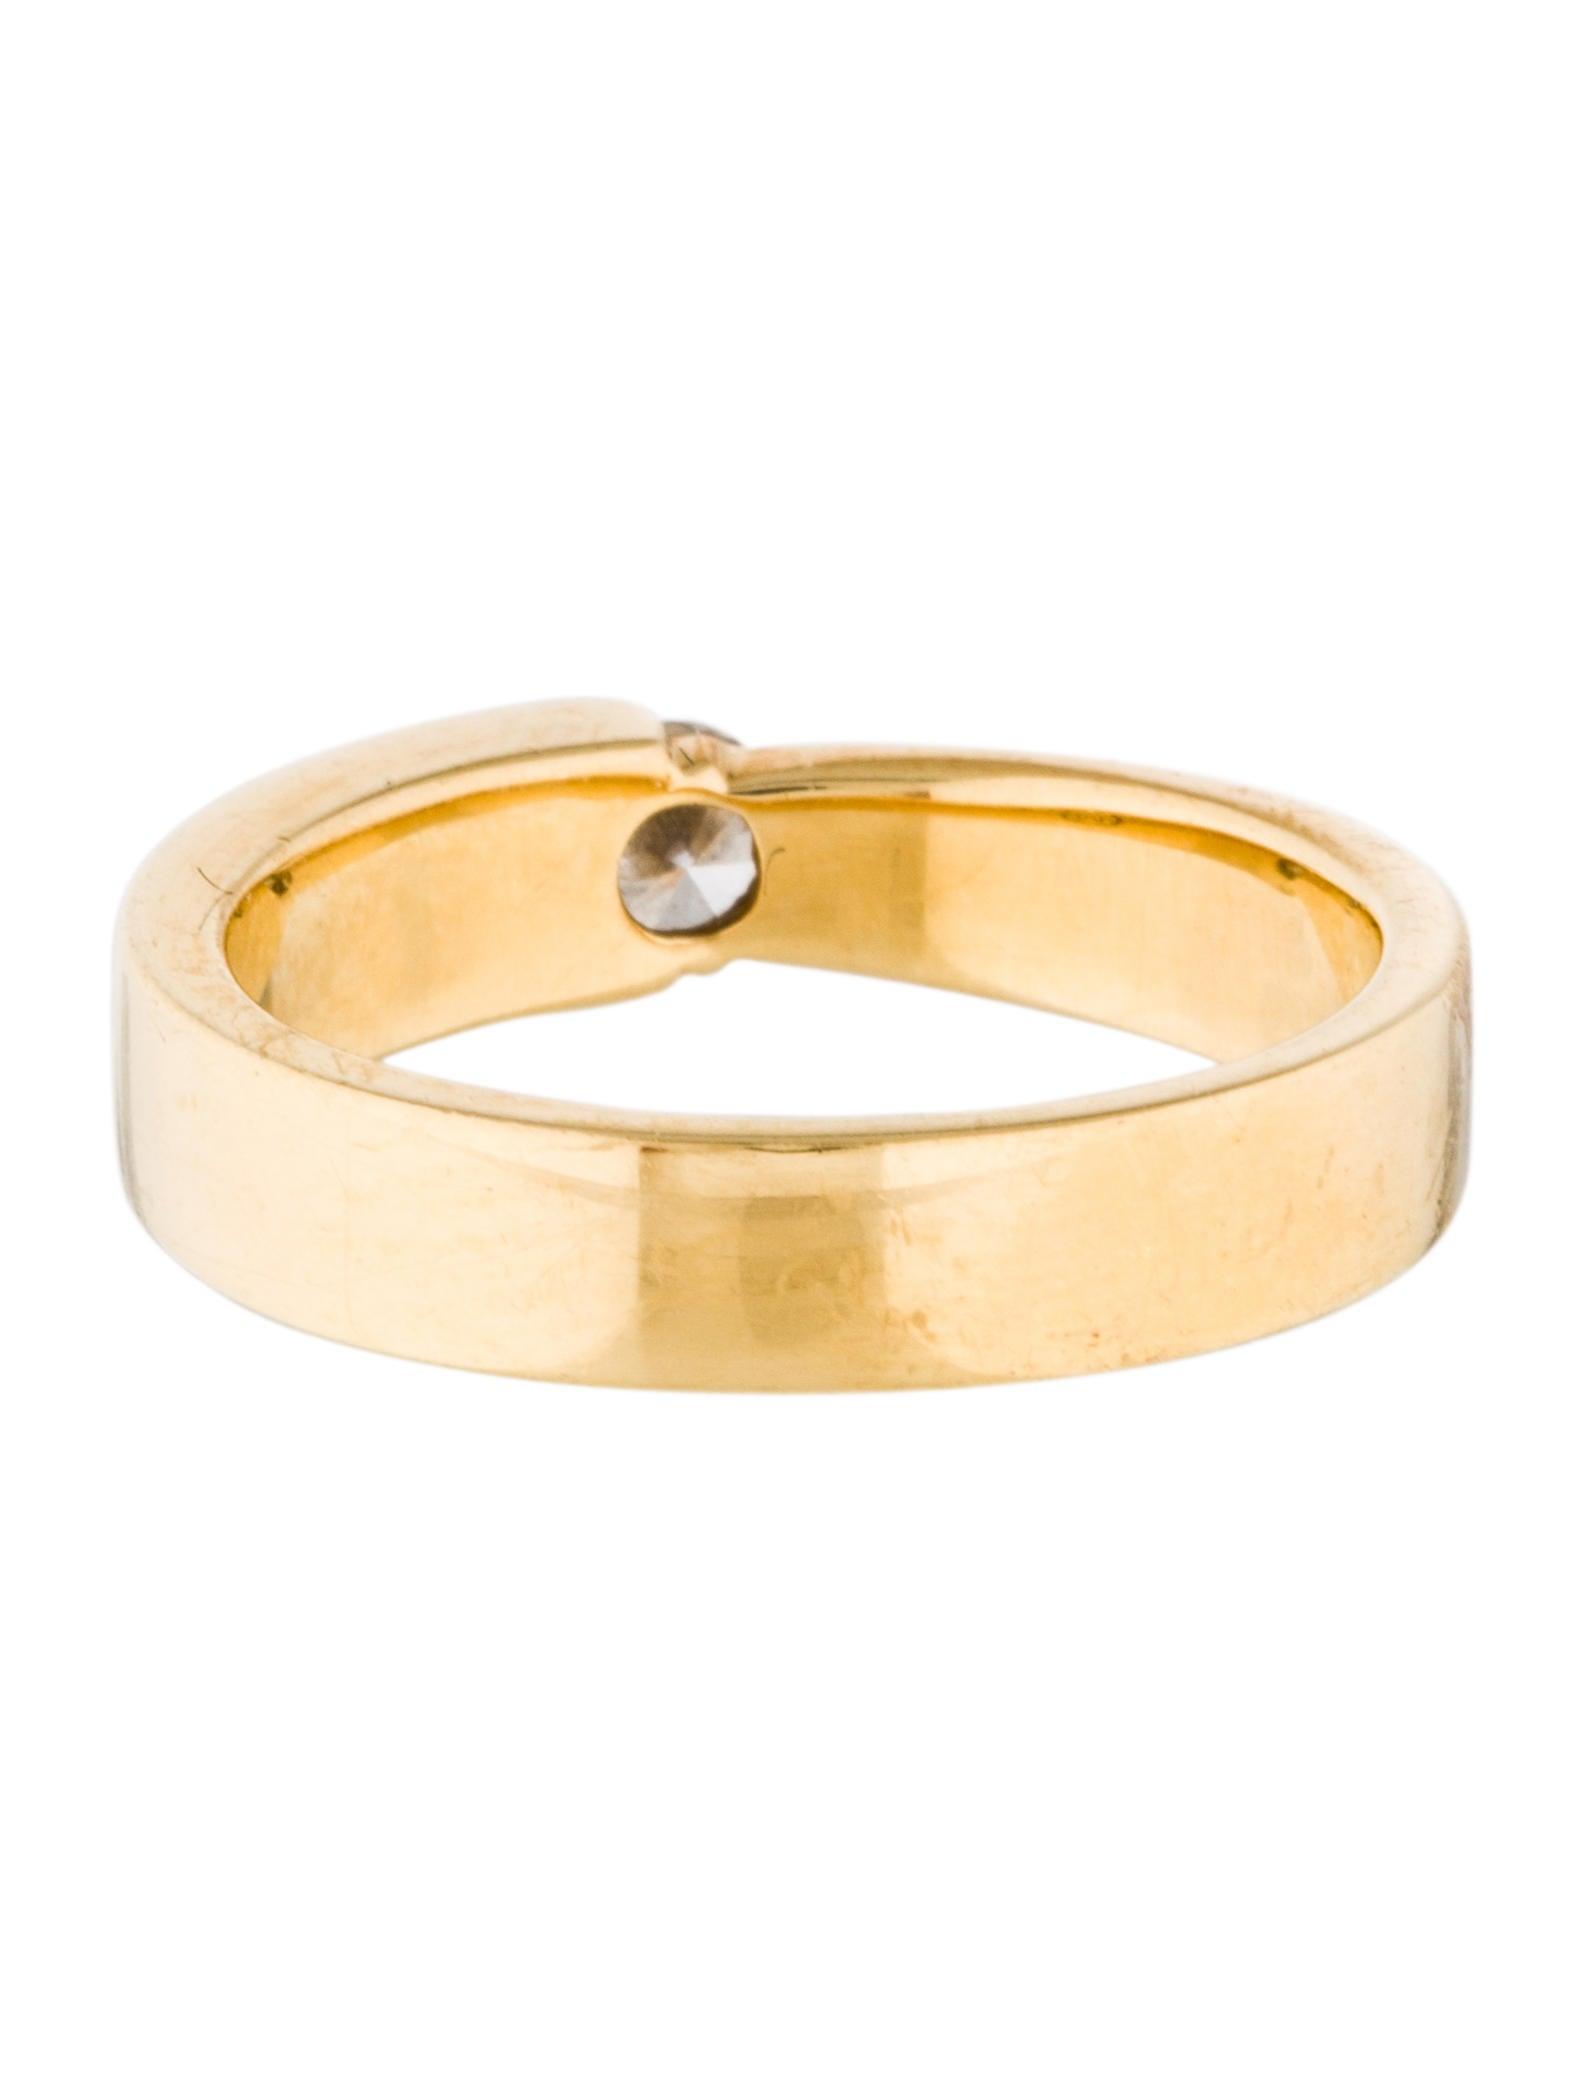 Movado 18K Diamond Band Rings MOV20768 The RealReal